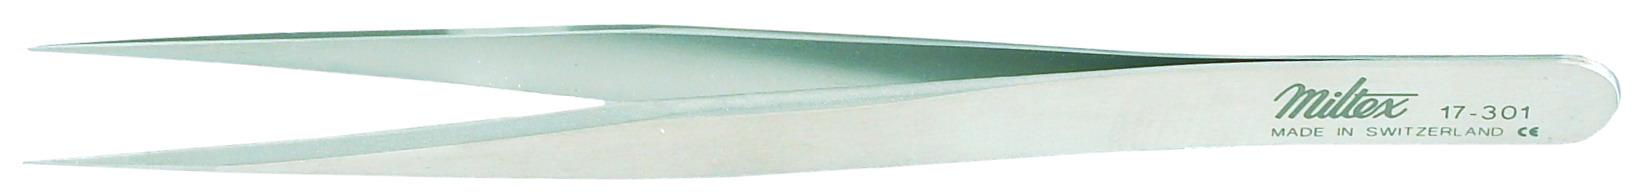 1-swiss-jeweler-fcps-17-301-miltex.jpg